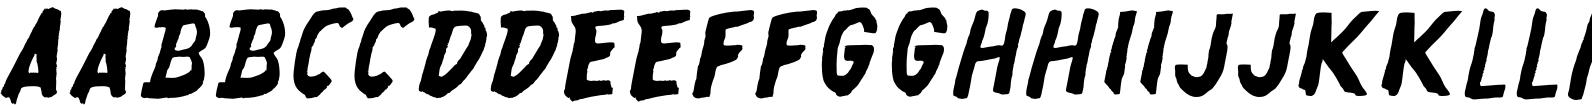 CA Smut